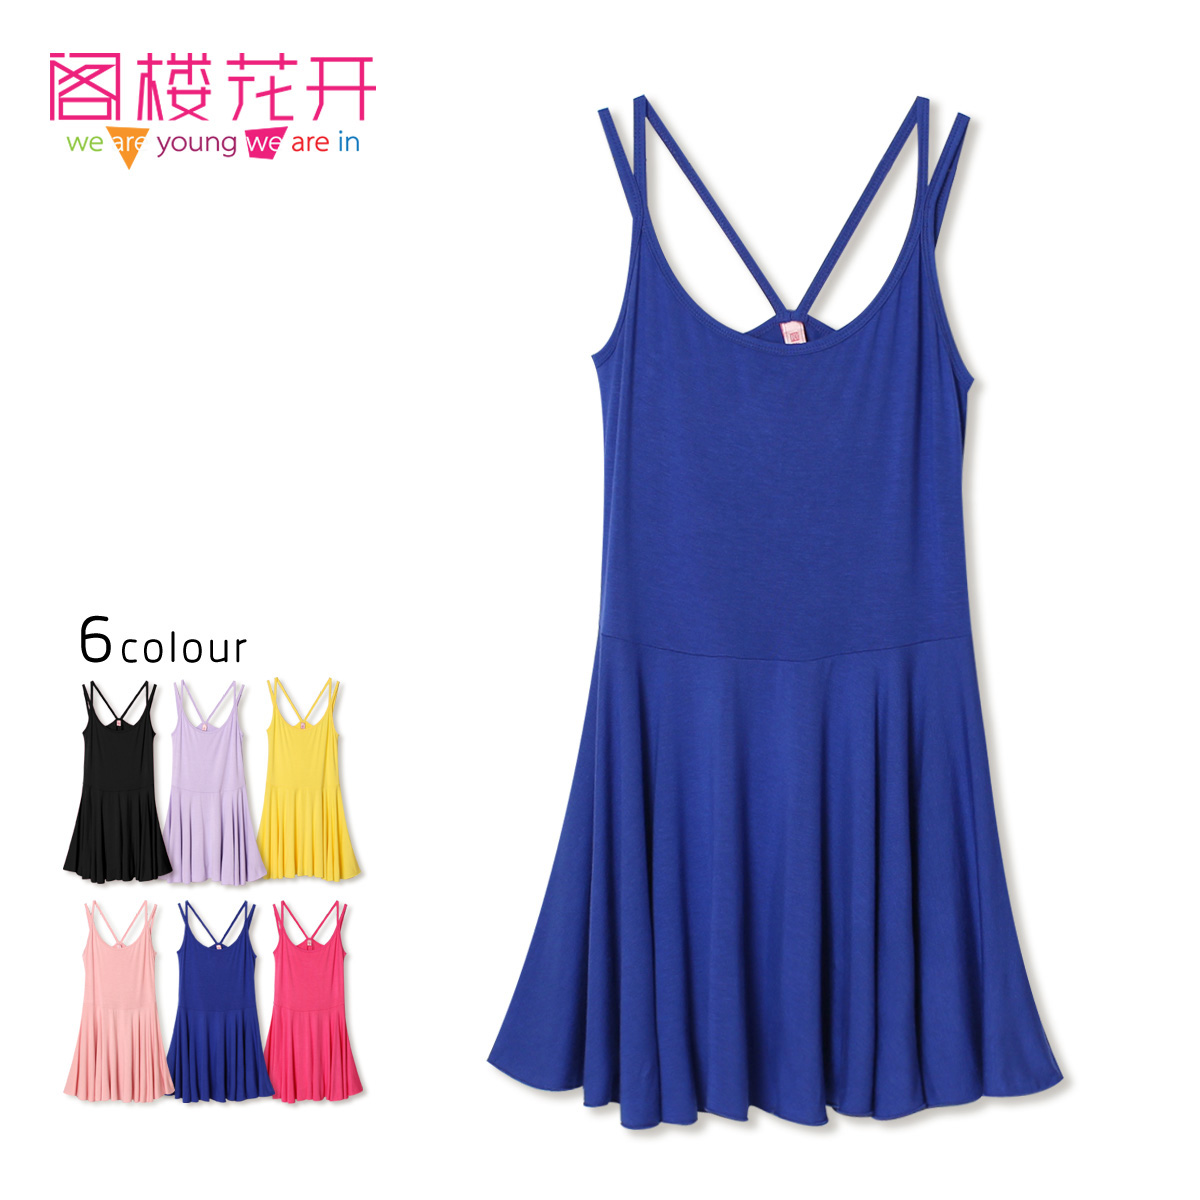 Женское платье Attic flowers g14cq0453